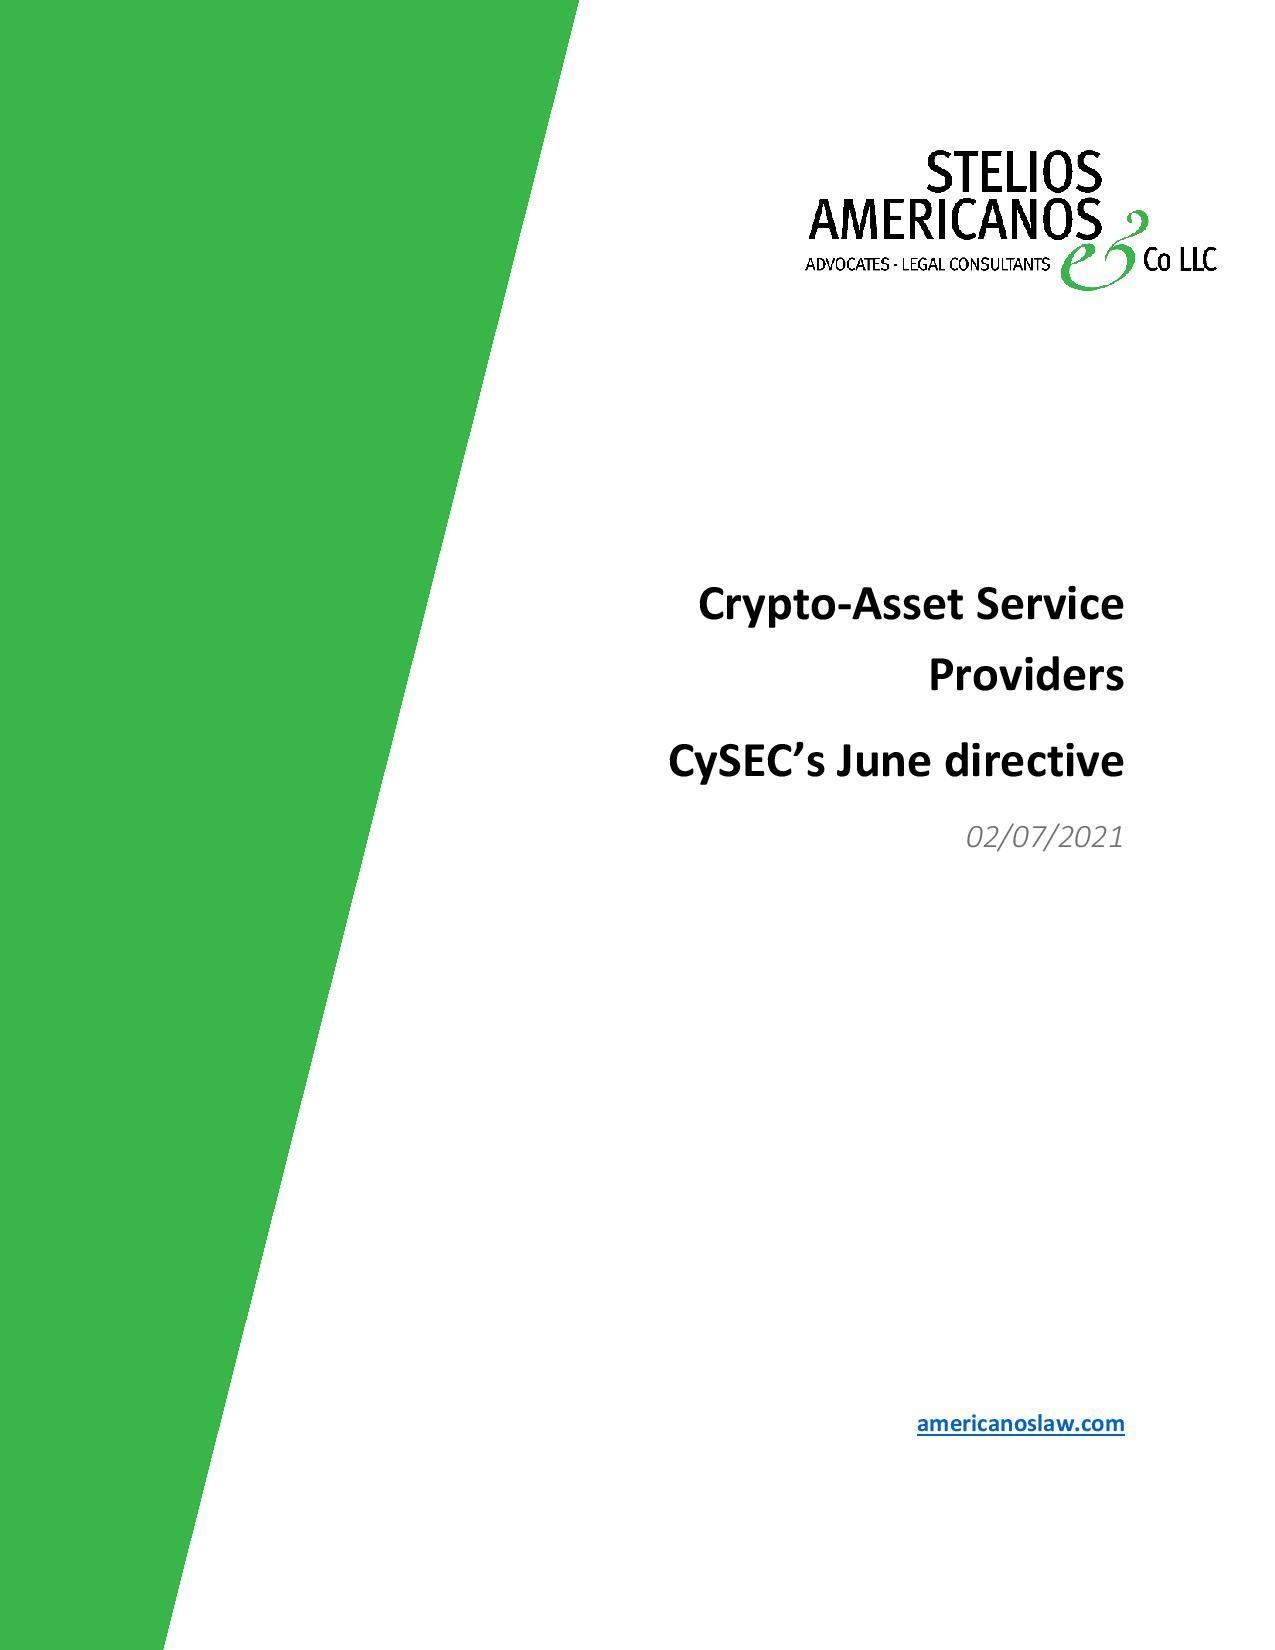 Stelios Americanos & Co LLC: Crypto-Asset Service Providers CySEC's June directive